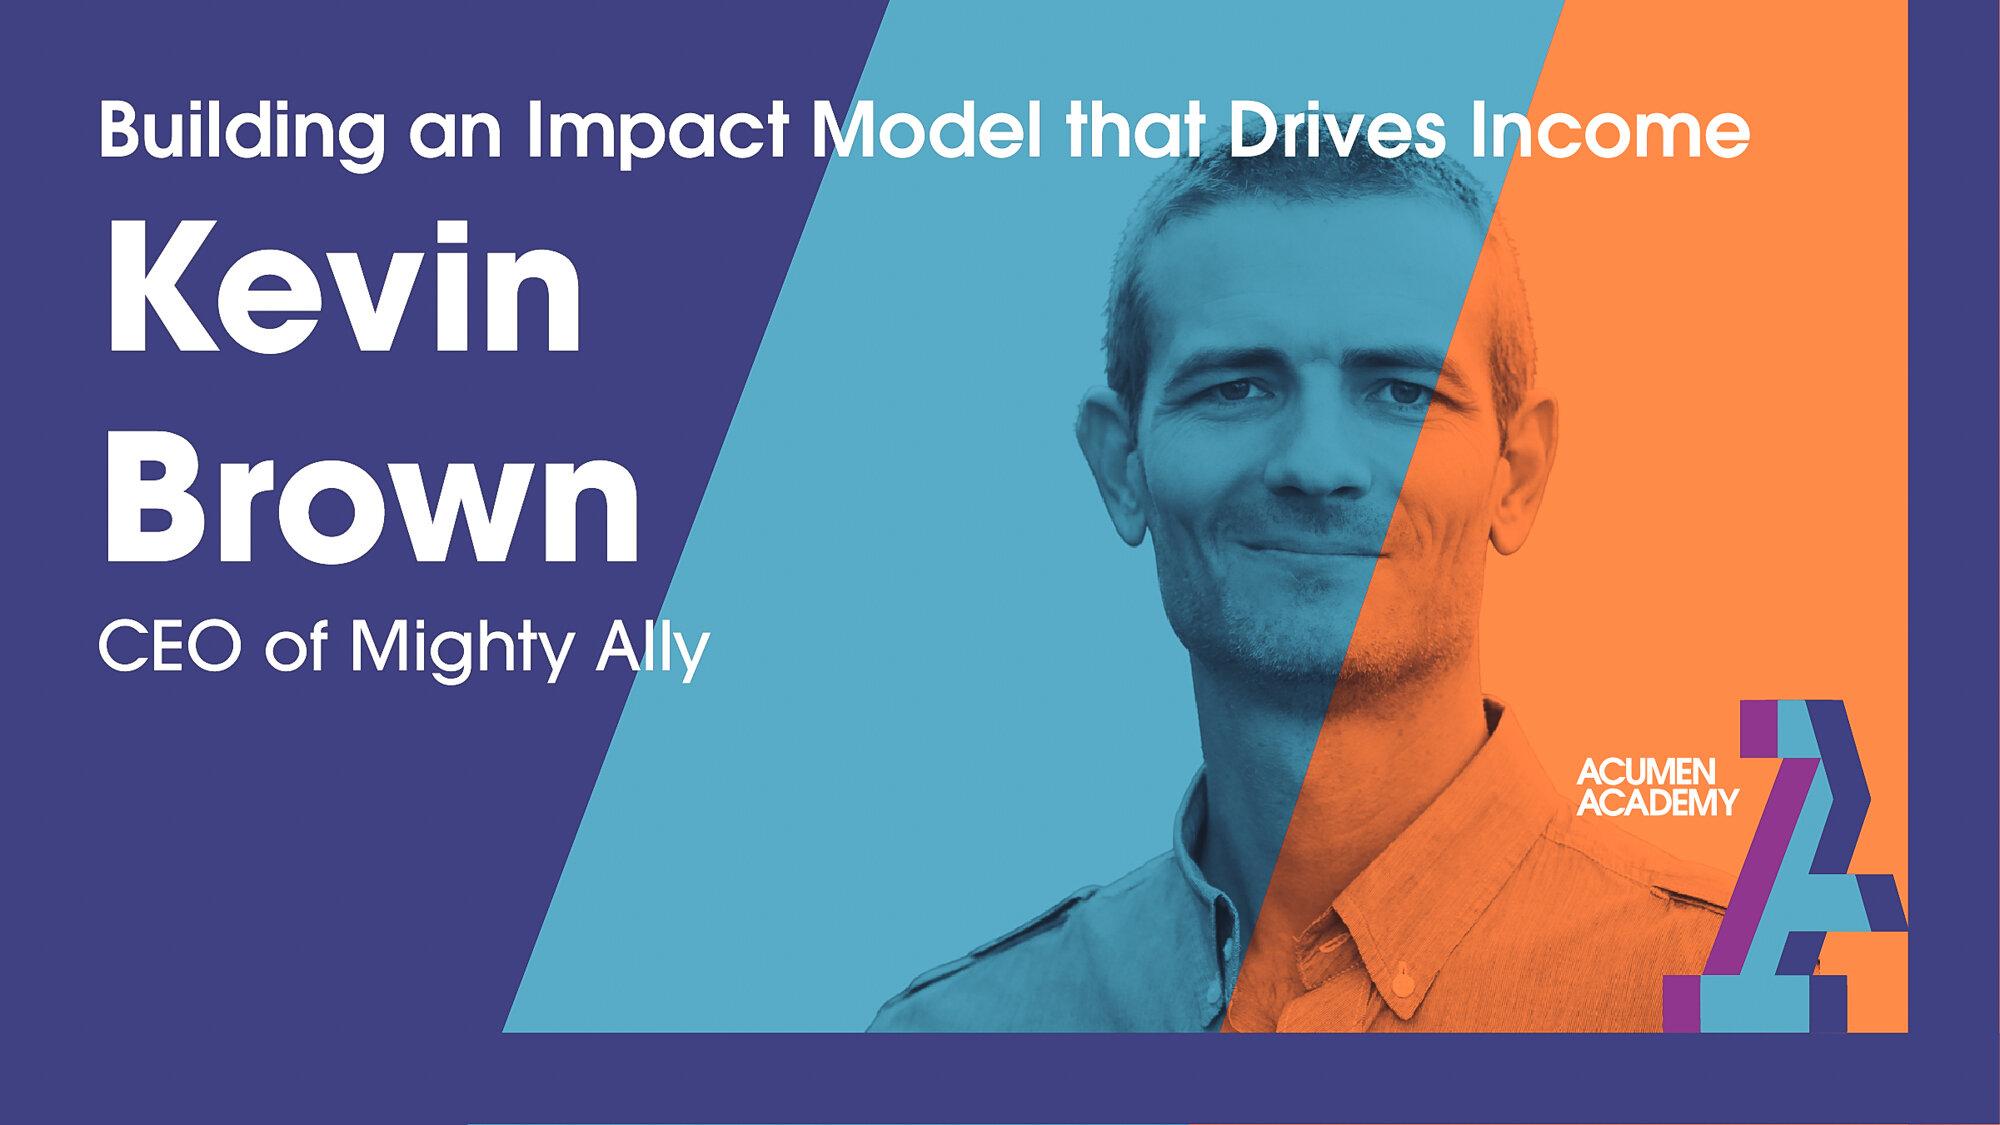 Acumen-Academy-Build-Kevin-Brown-MIGHTY-ALLY.jpg